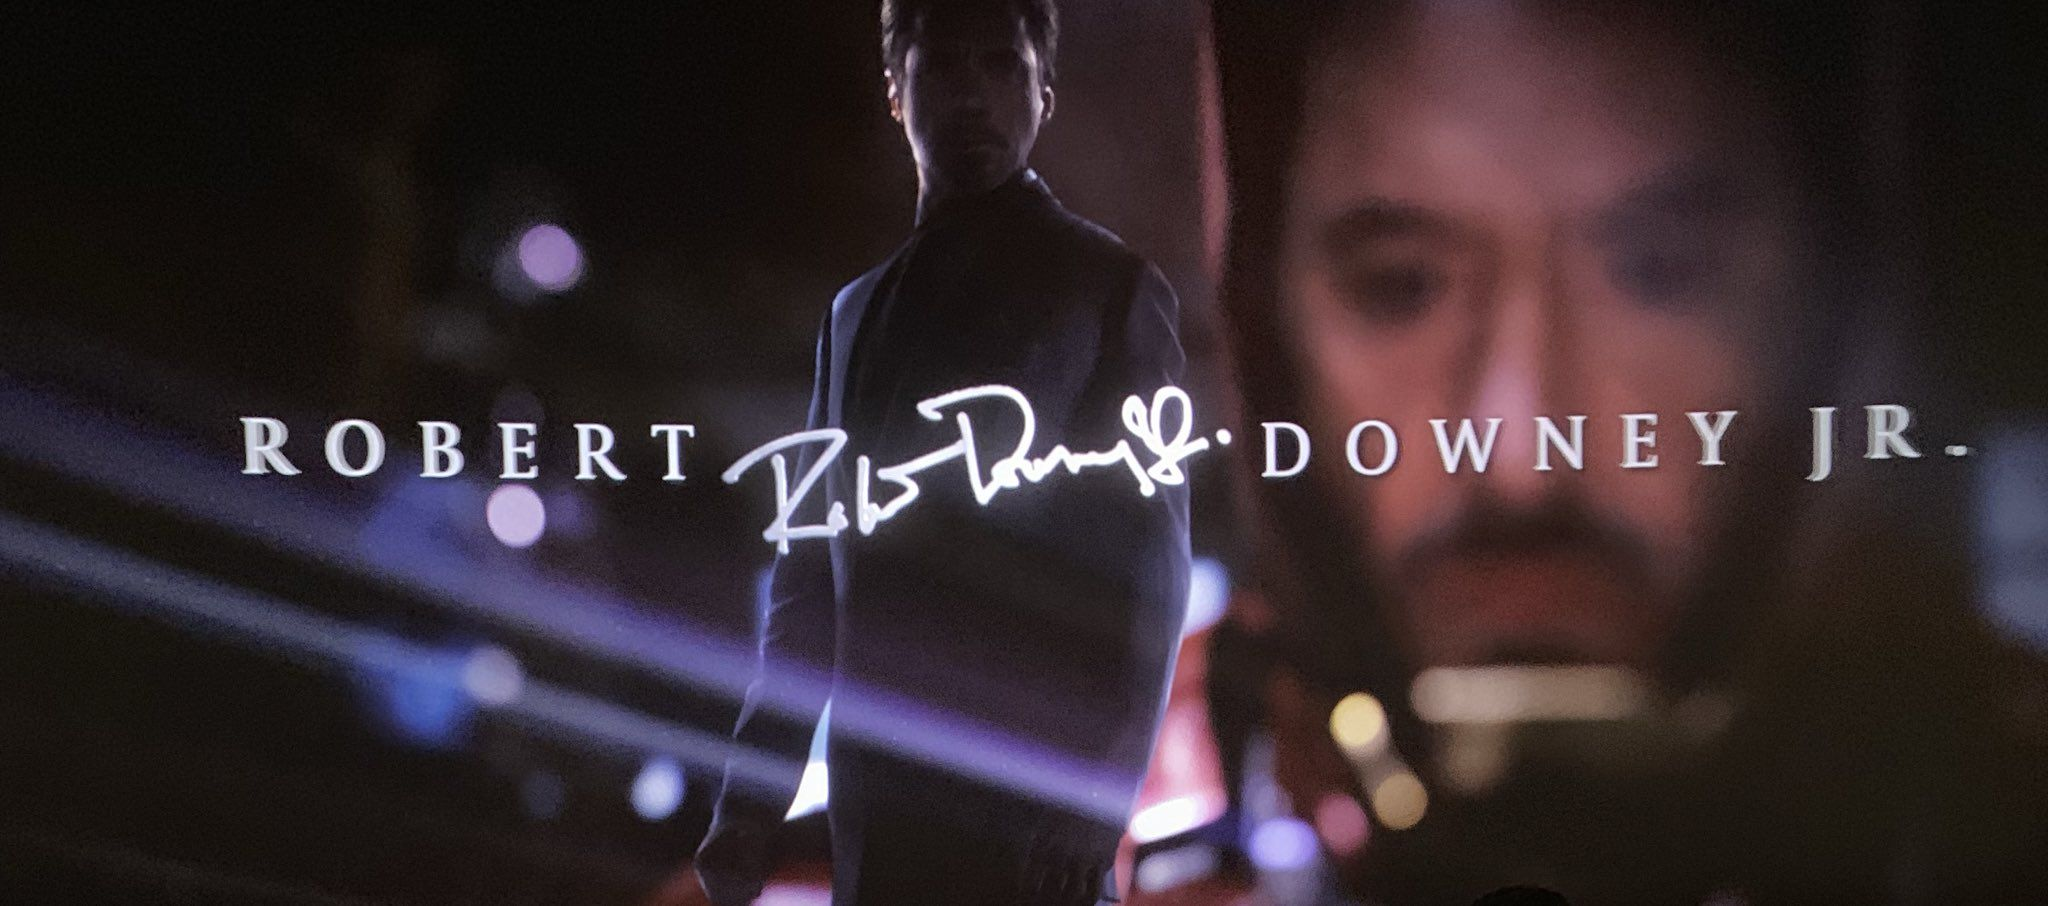 Ben On Twitter Downey Junior Robert Downey Jr Downey